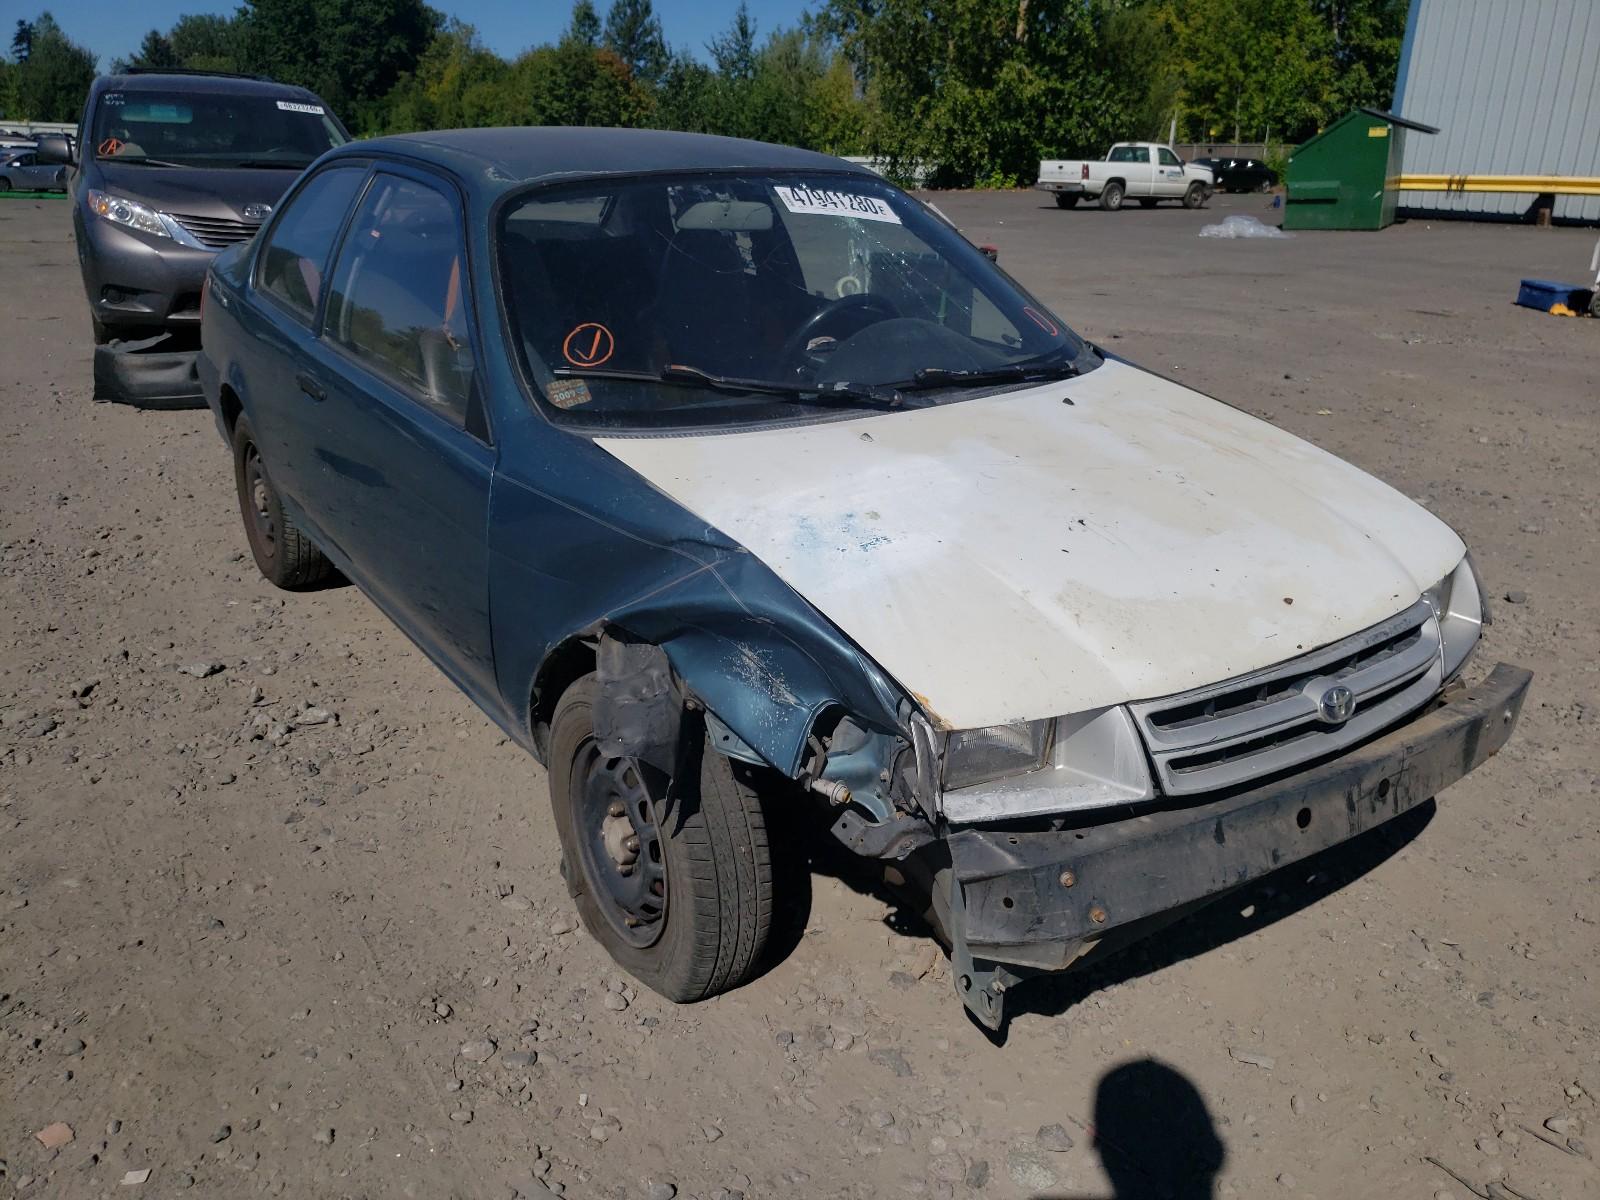 1993 toyota tercel std for sale at copart portland or lot 47941280 salvagereseller com salvagereseller com